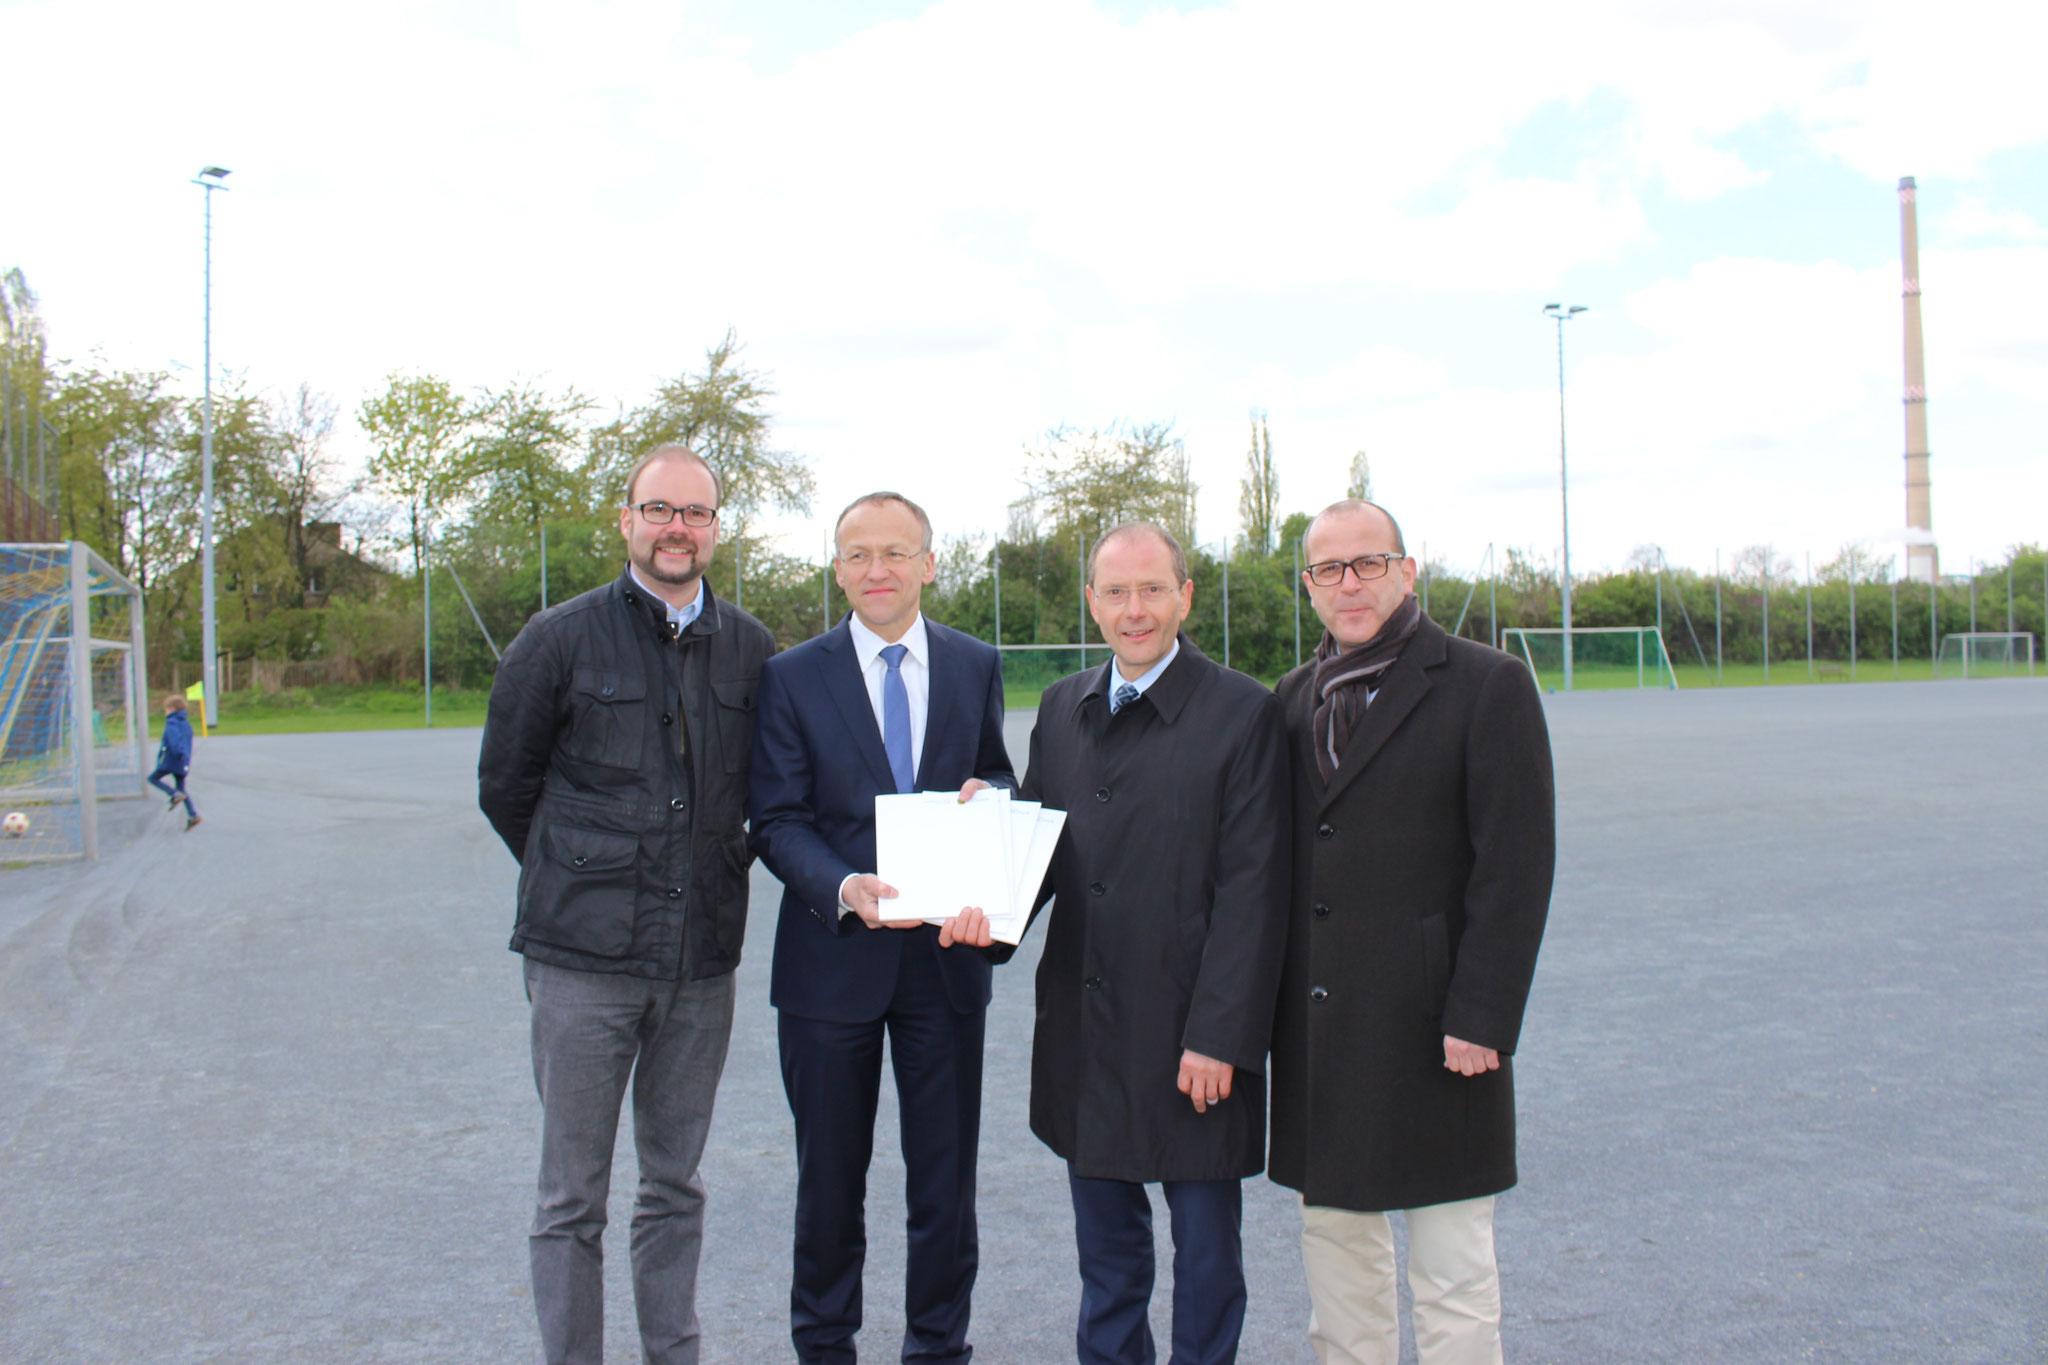 Sportbürgermeister Dr. Peter Lames (2.v.l.) gemeinsam mit den Fördermittelgebern StM Markus Ulbig  und den Abgeordneten Christian Piwarz & Martin Modschiedler